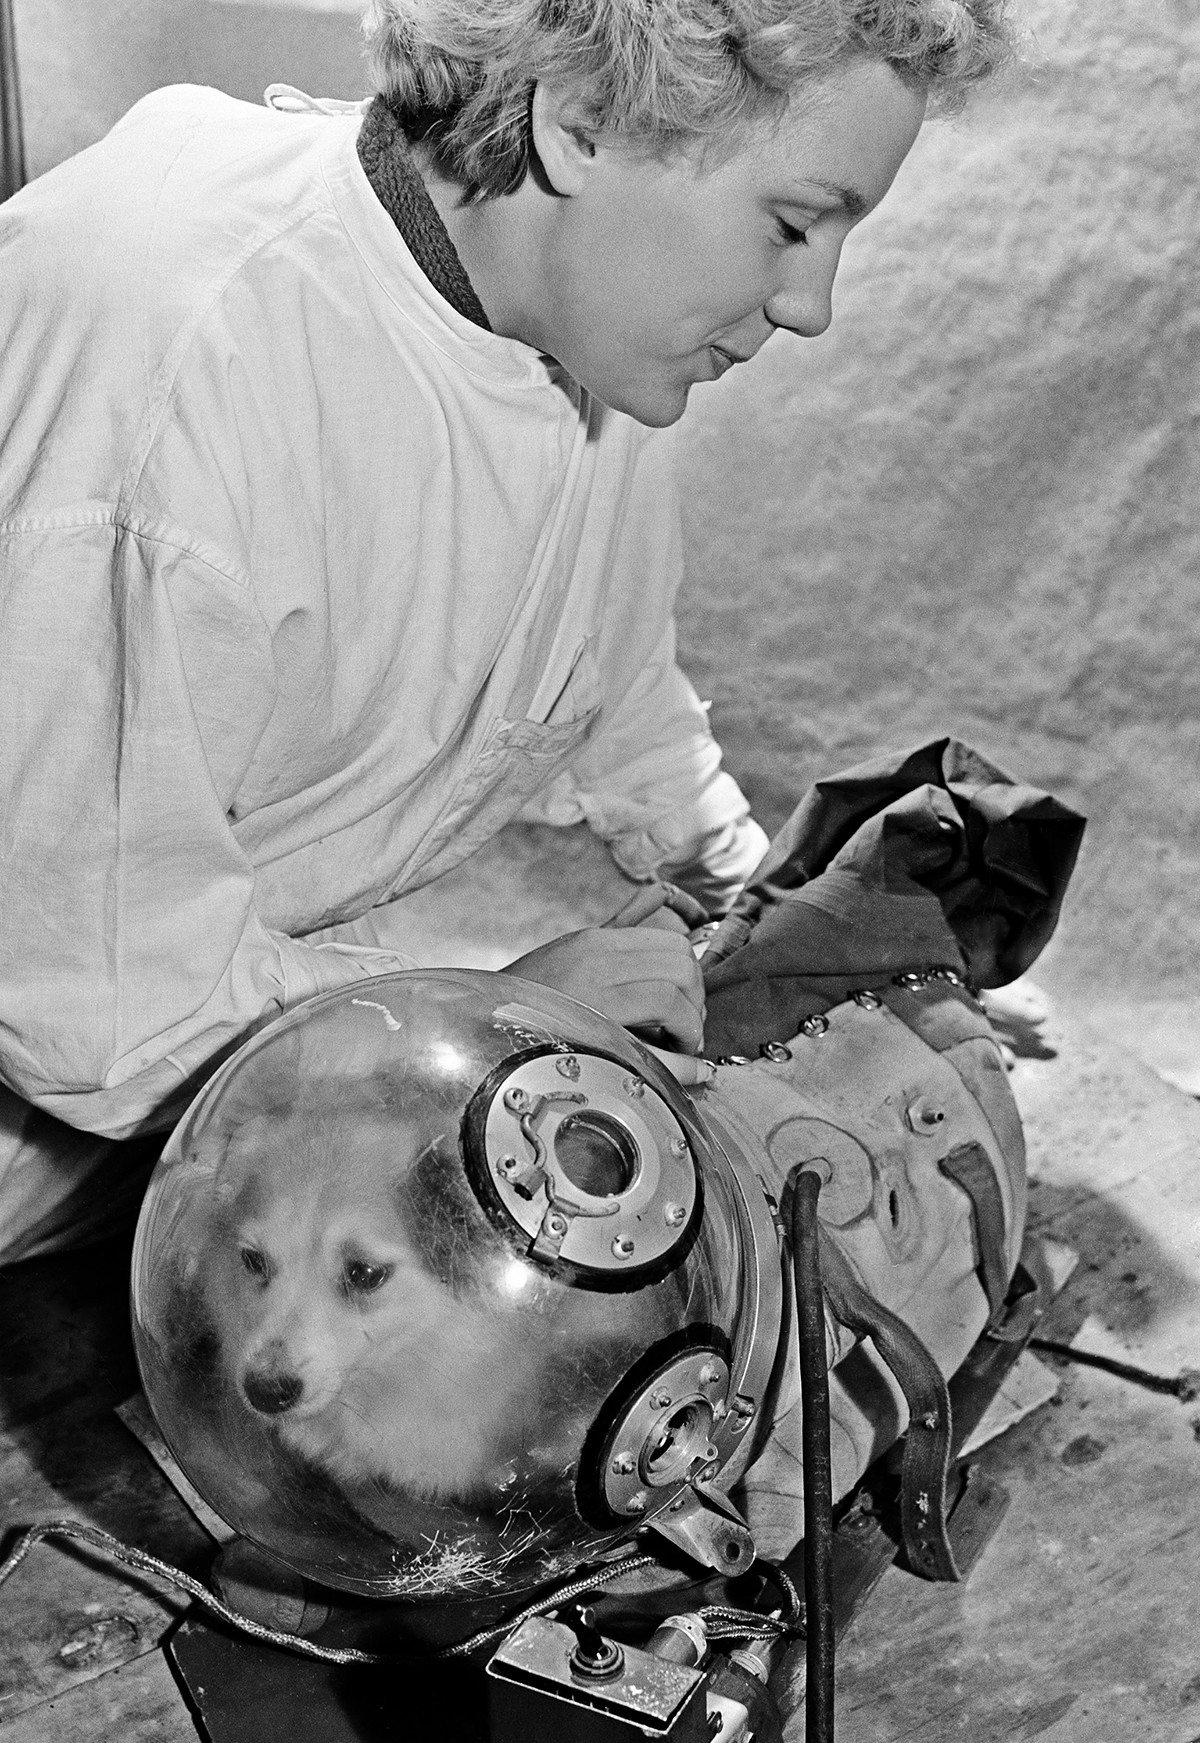 La asistente de laboratorio Natasha Kazakova entrena al perro espacial Kozyavka para un vuelo espacial de prueba en 1959.